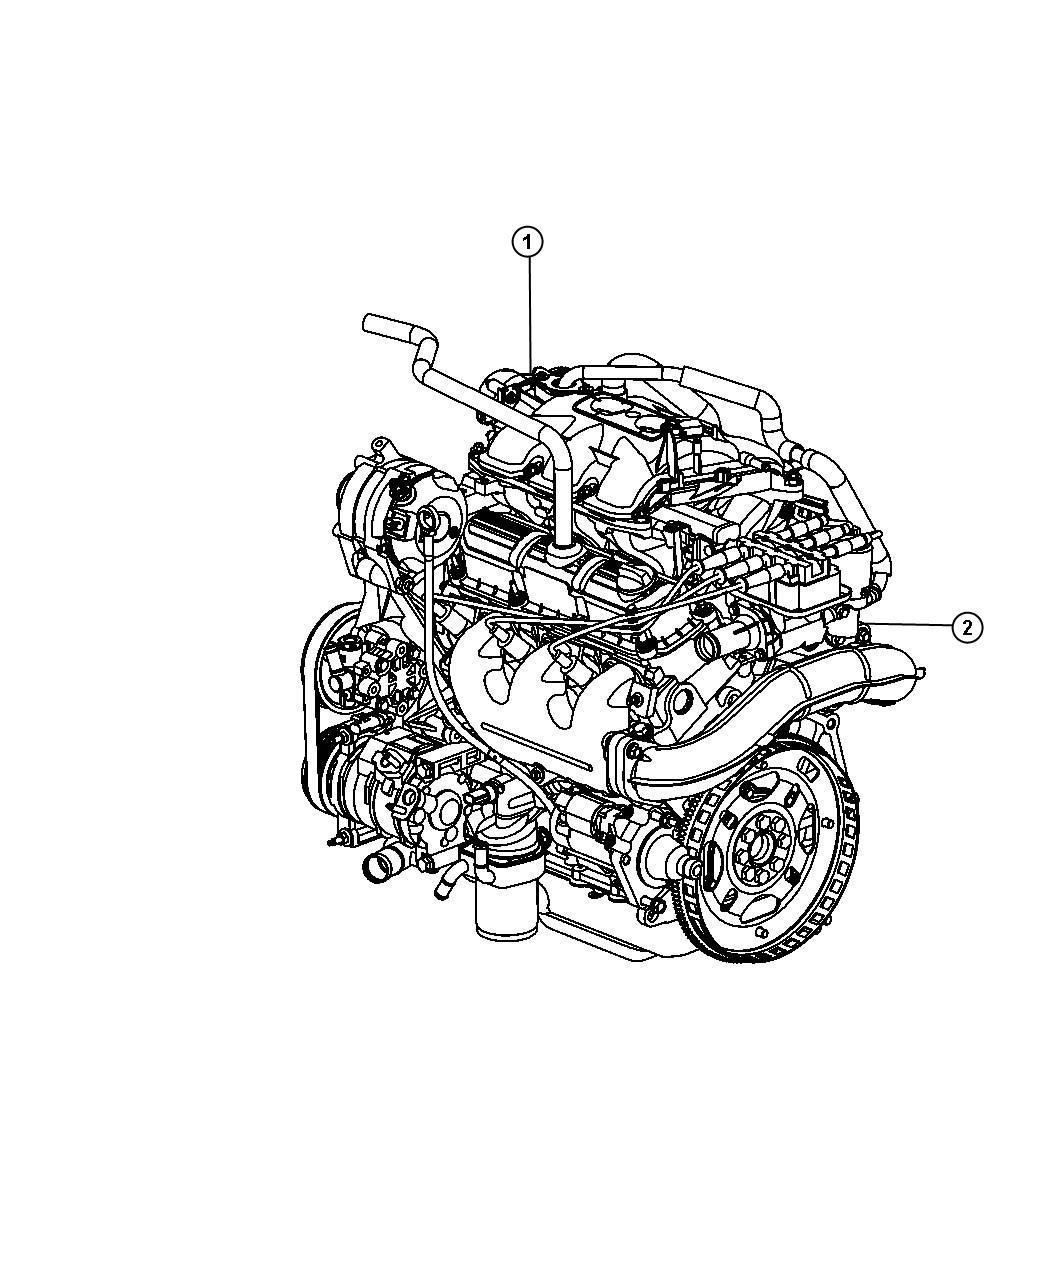 Jeep Wrangler Engine Long Block Remanufactured Timing